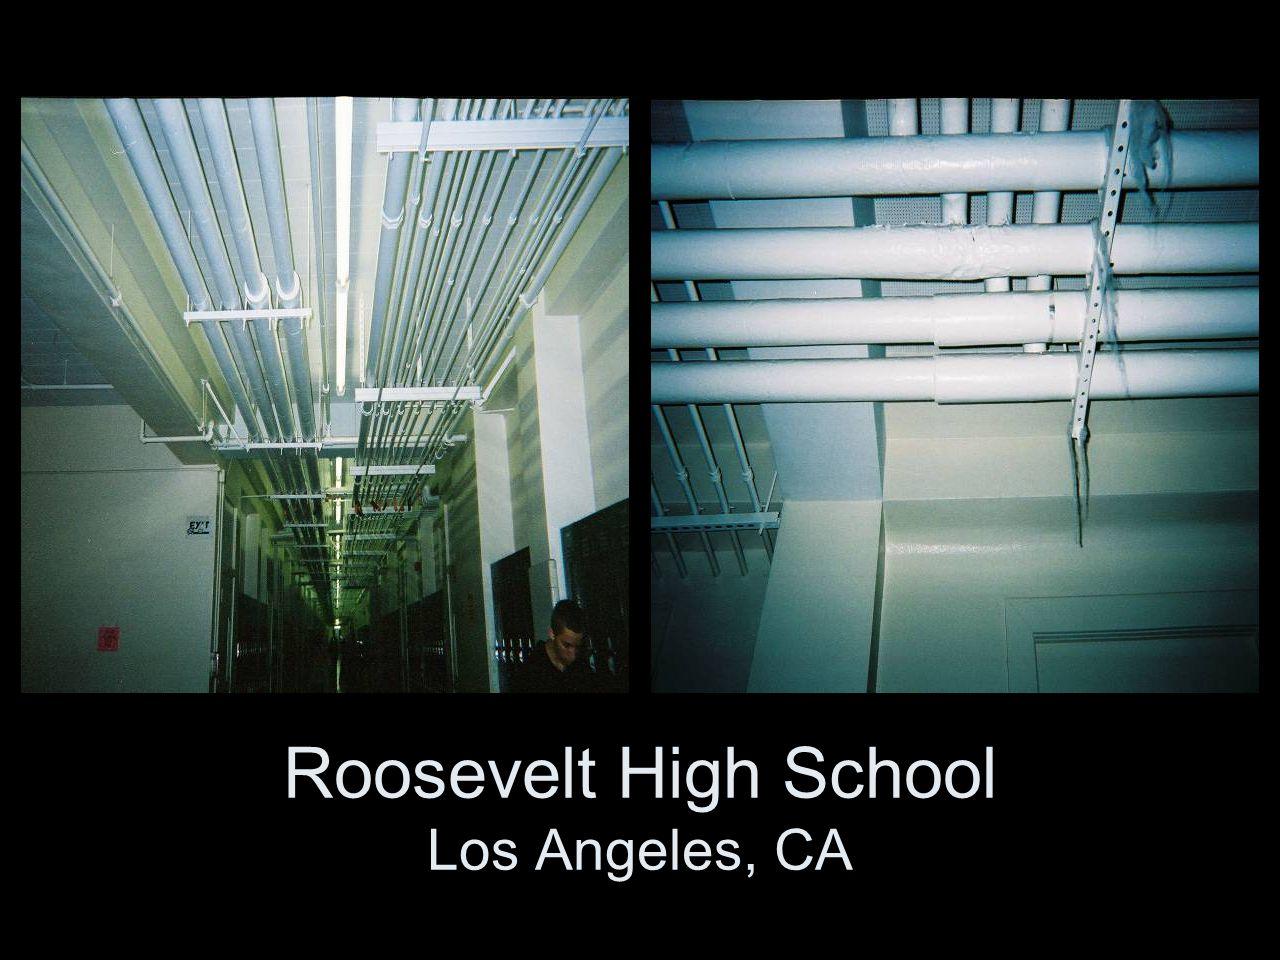 Roosevelt High School Los Angeles, CA